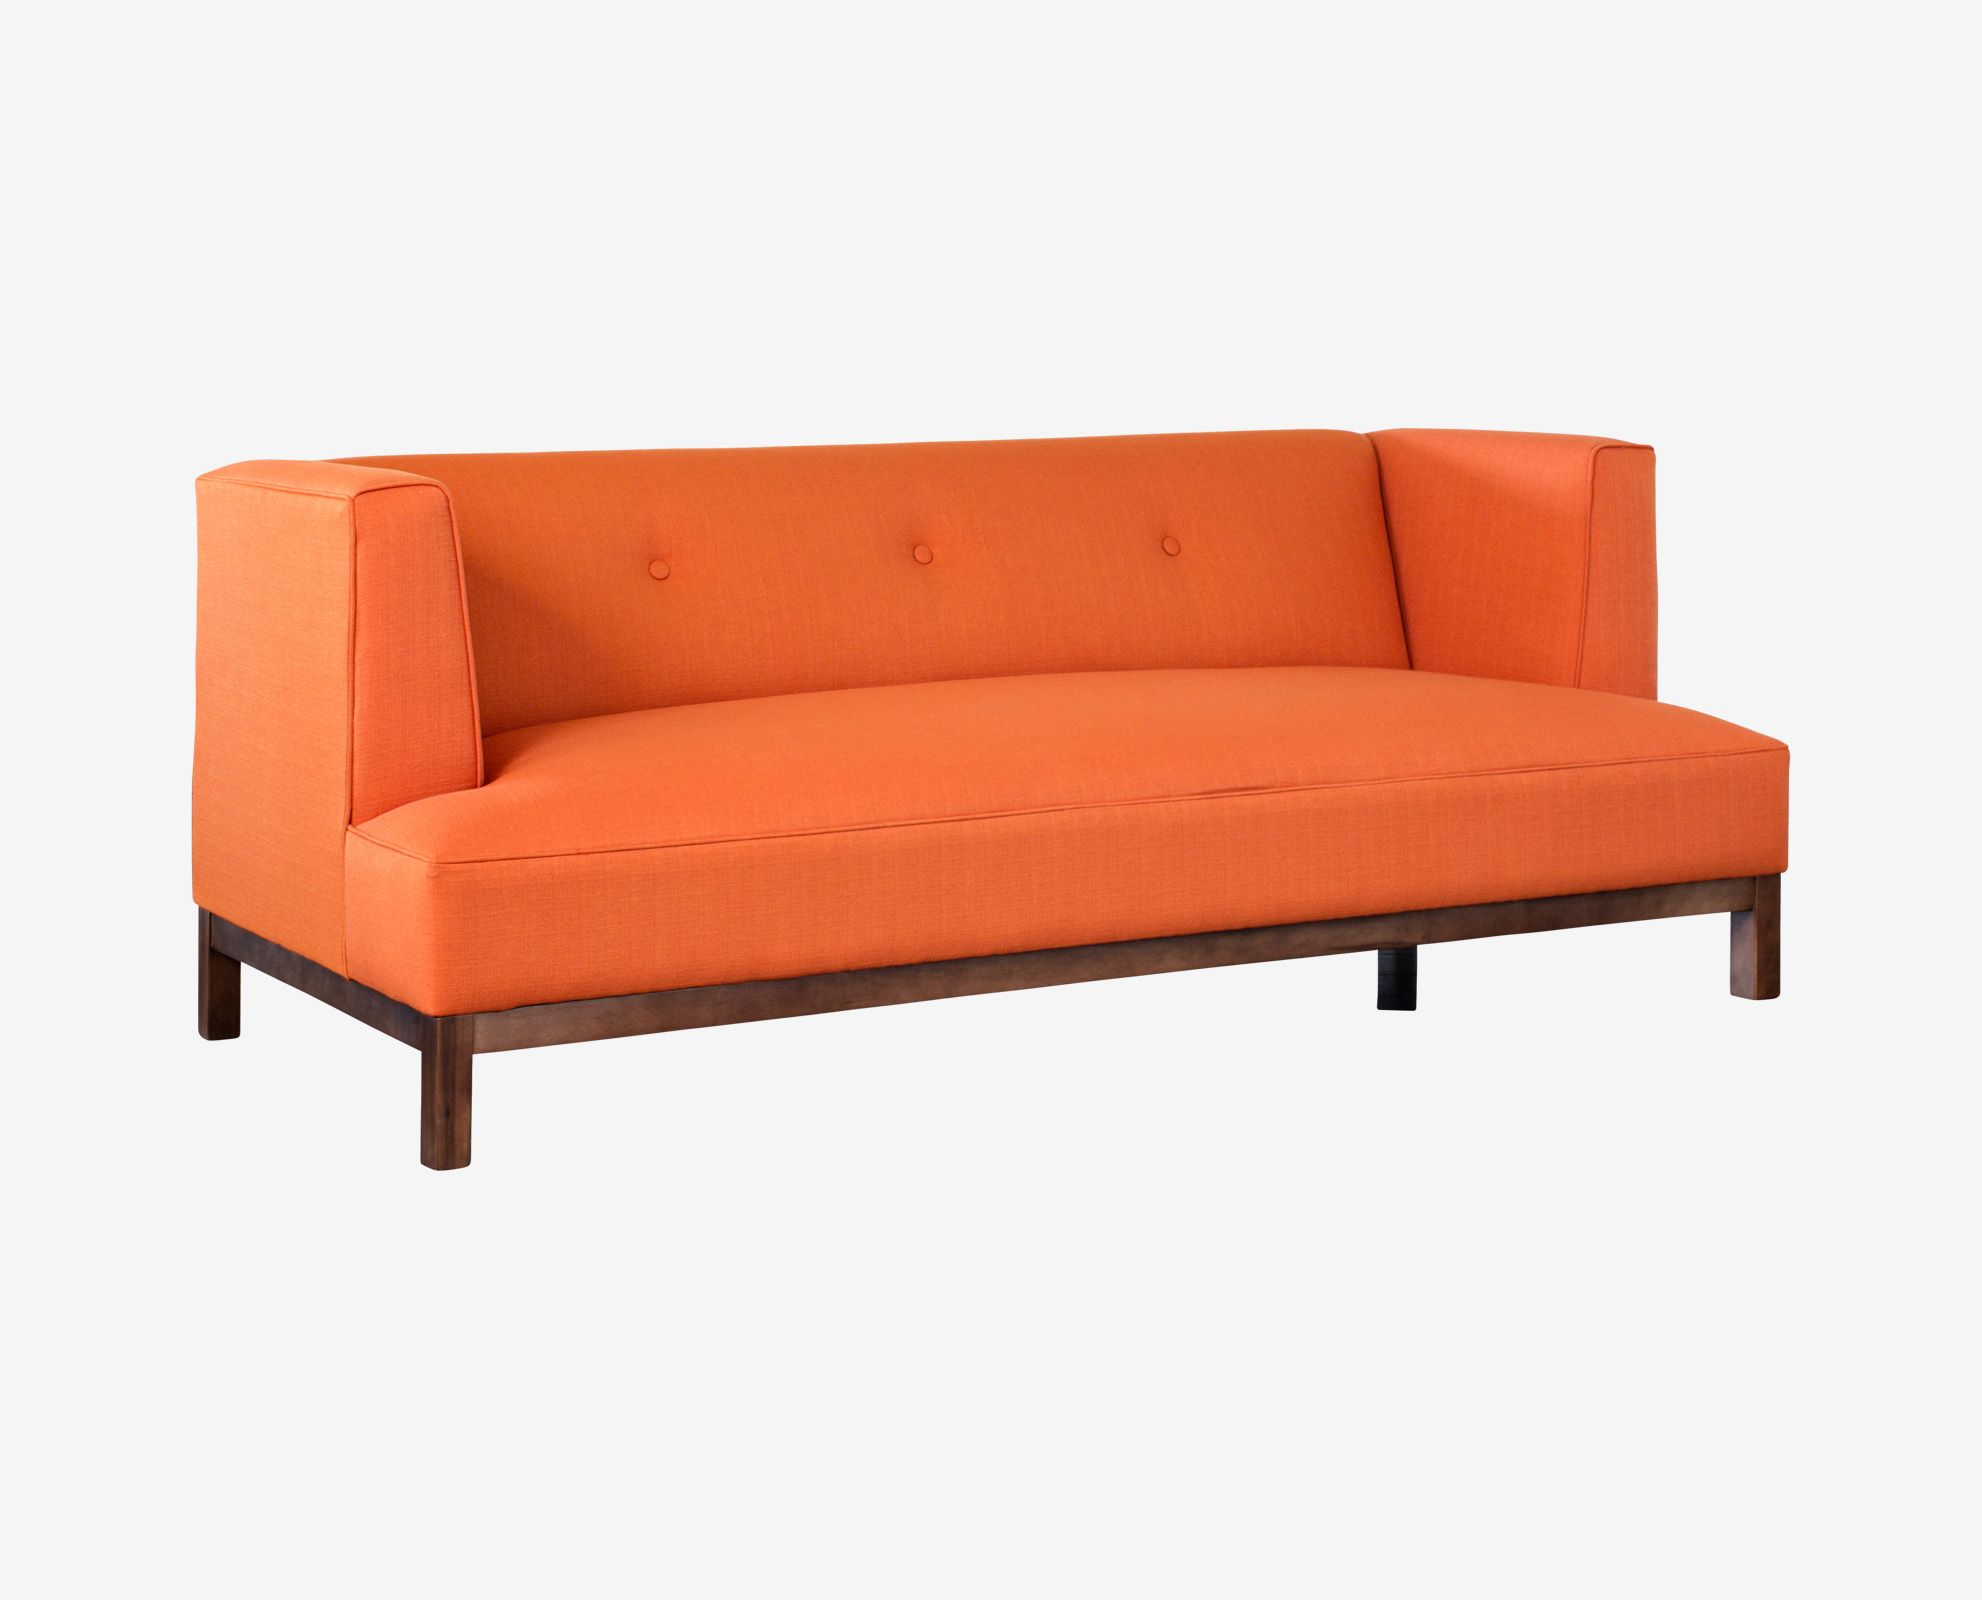 Scandinavian Designs - The Lamare sofa has it all - crisp, clean ...